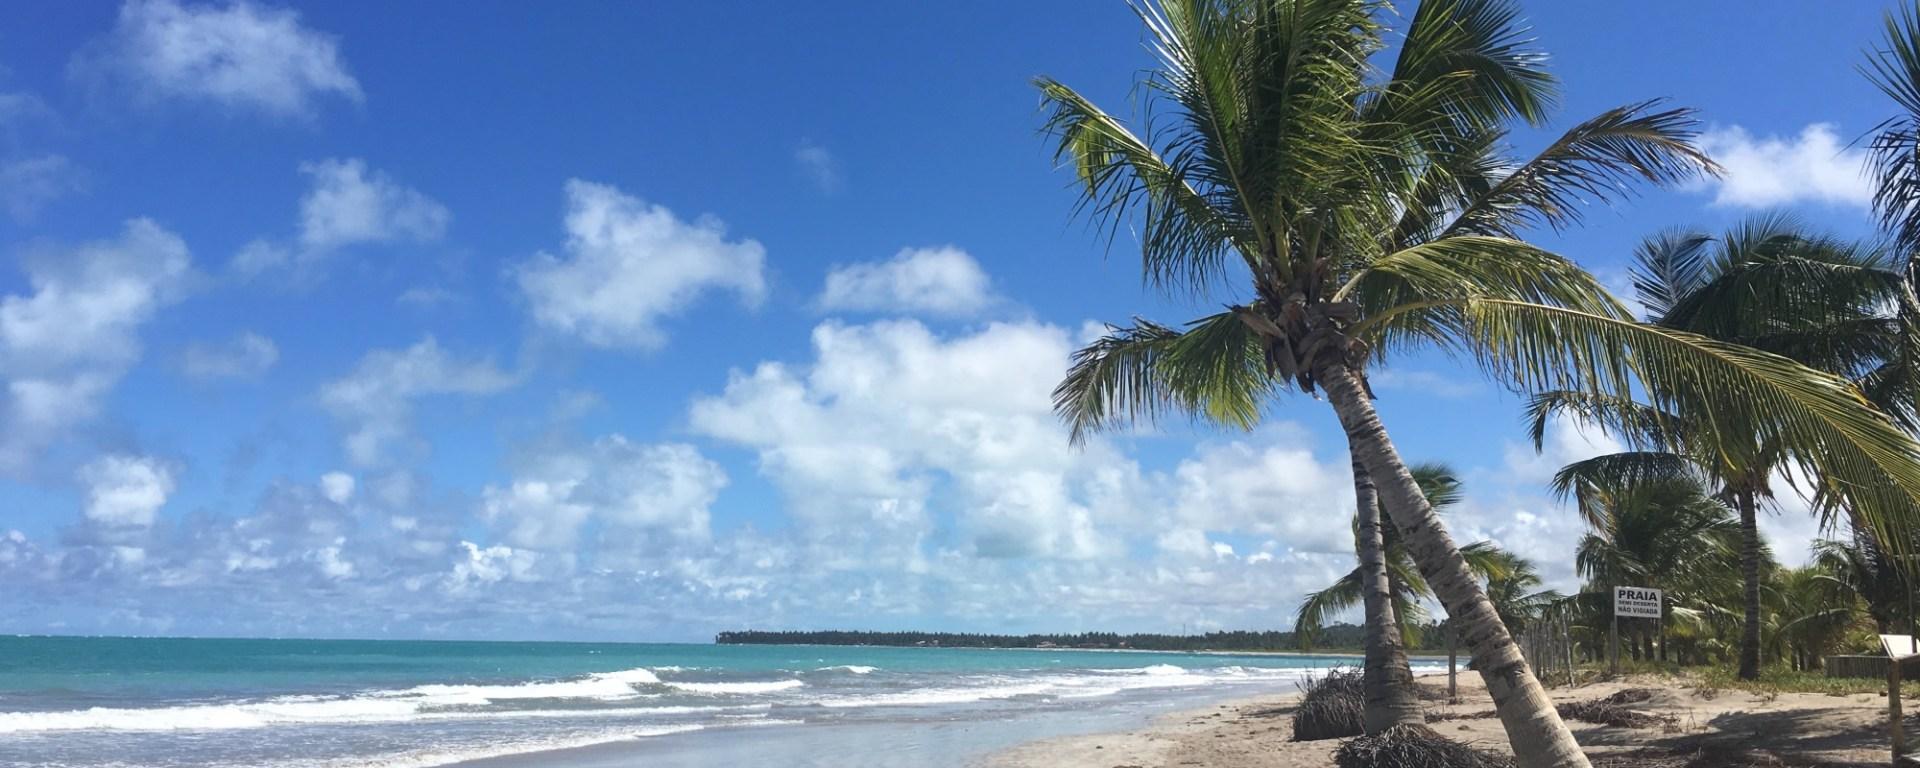 Maceió, Alagoas, praia de Ipioca, Hibiscus